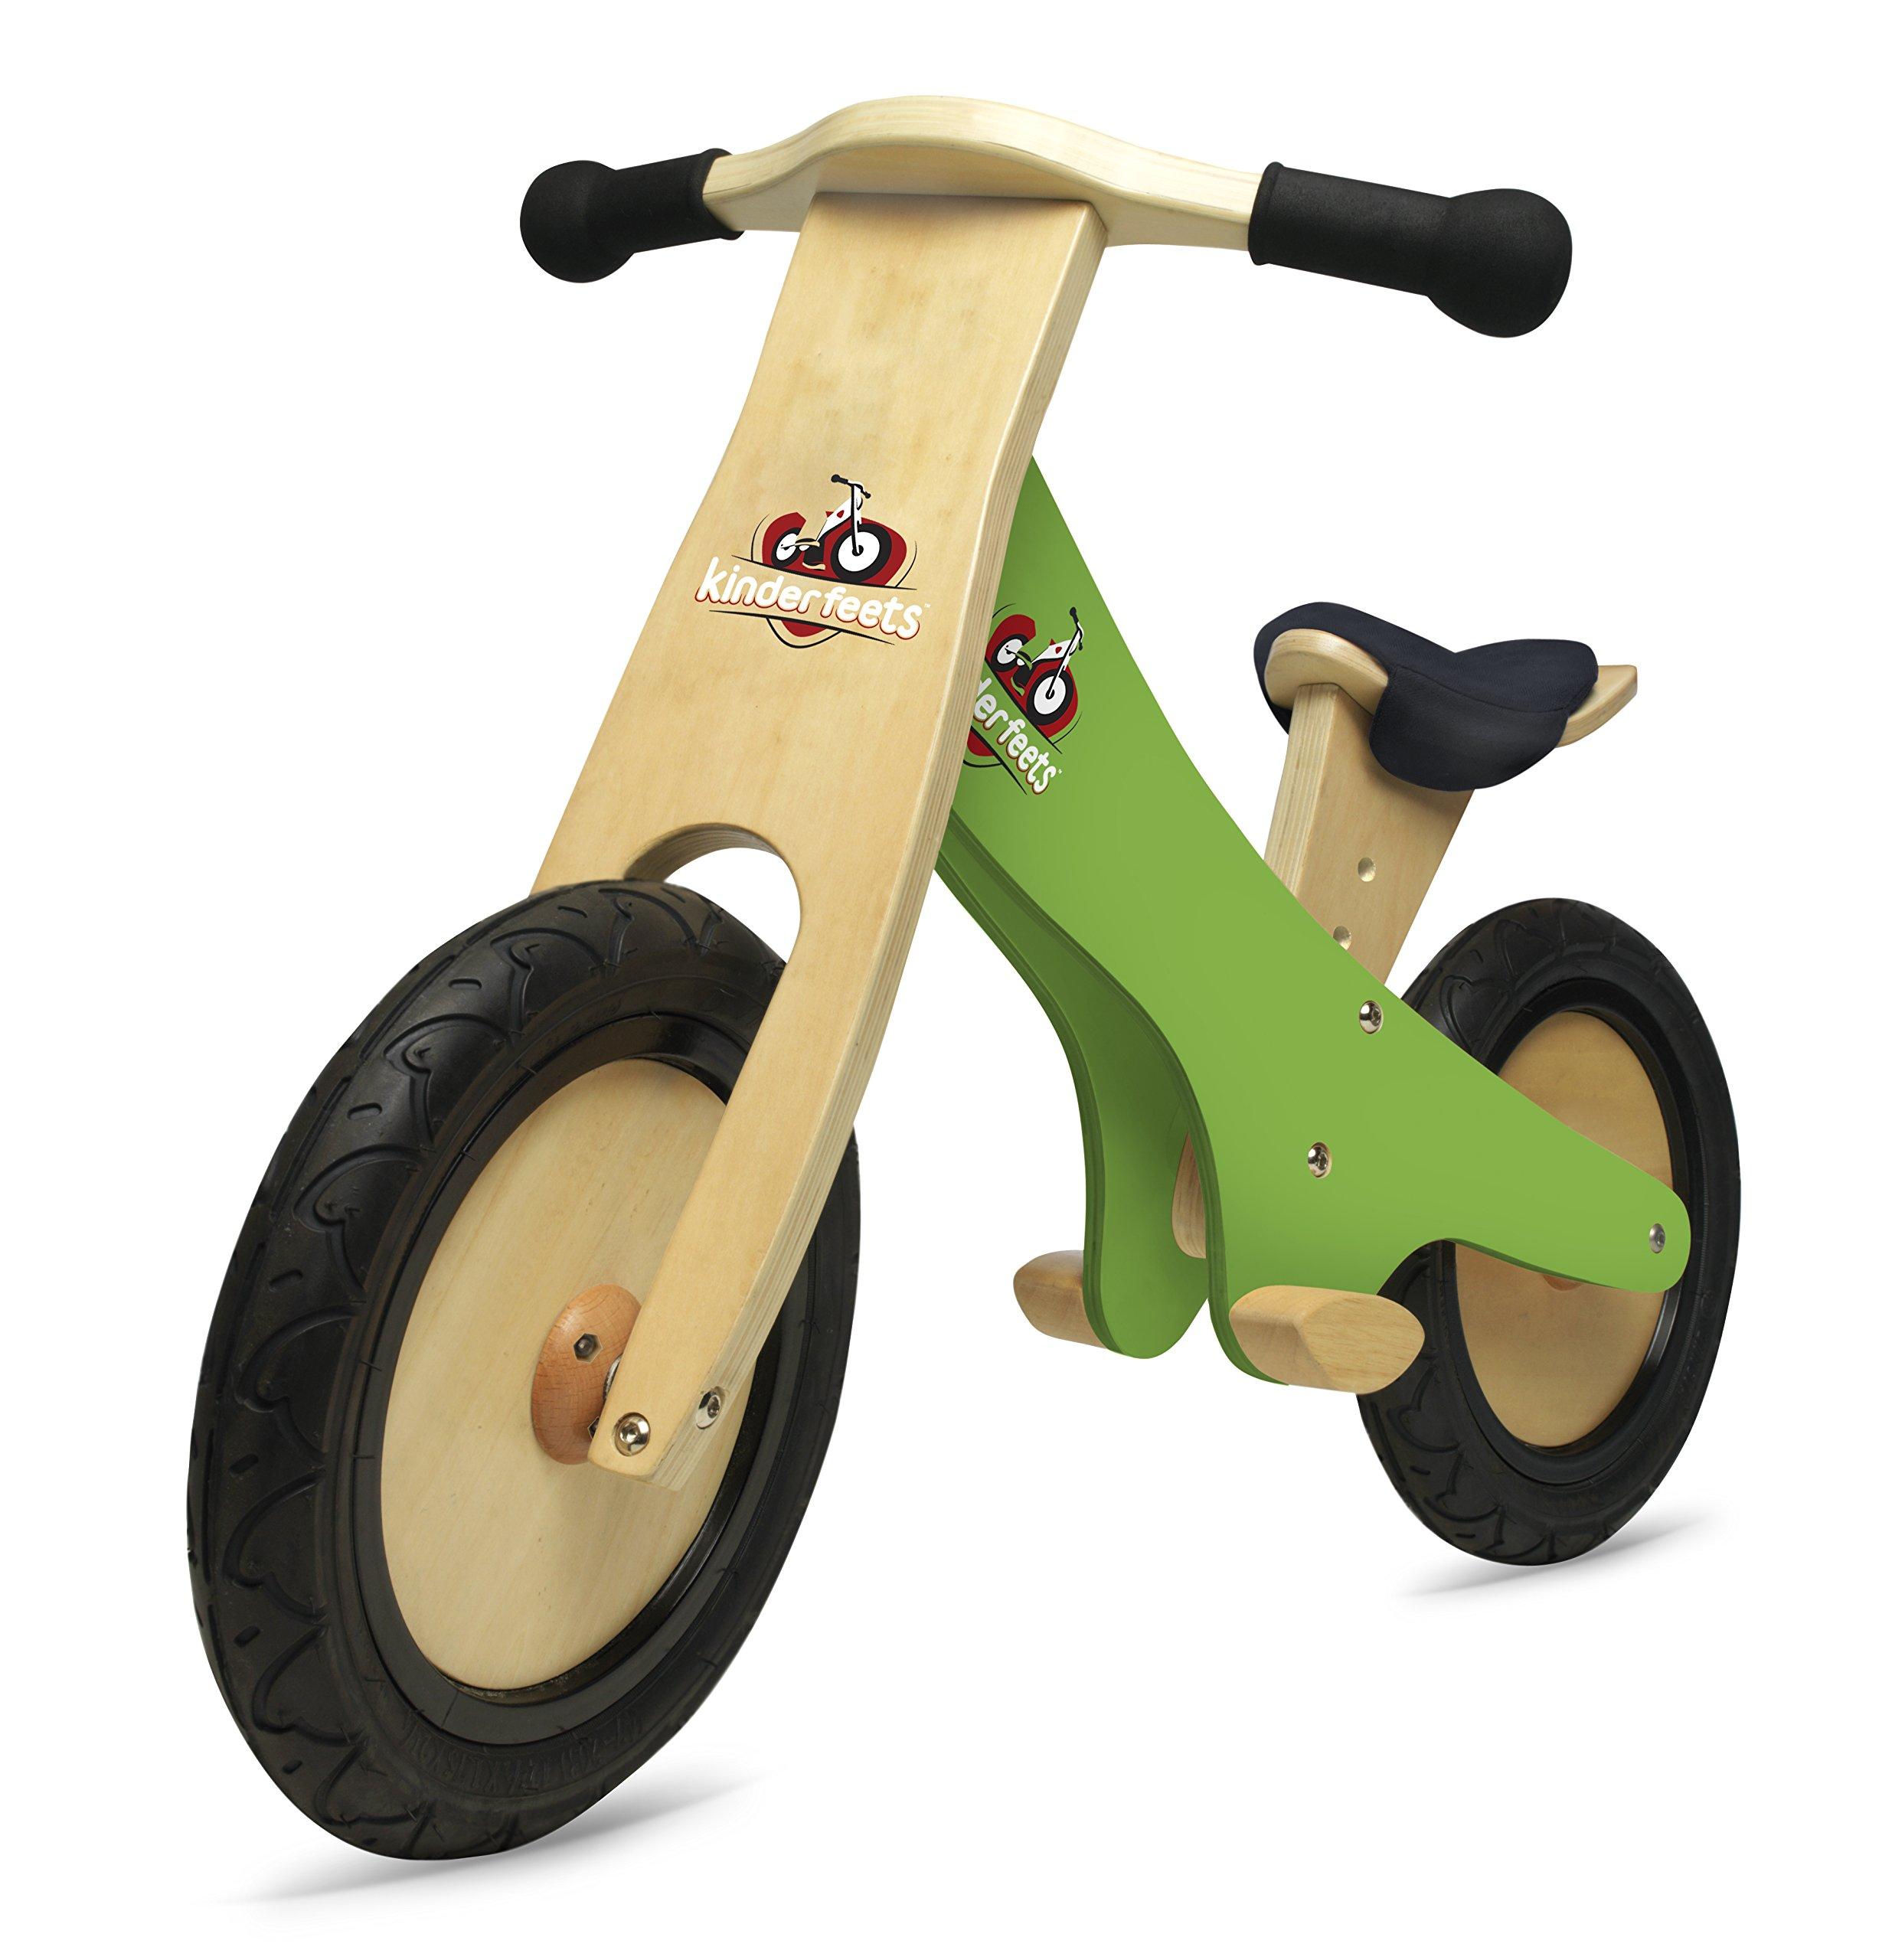 Kinderfeets Classic Chalkboard Wooden Balance Bike, Kids Training No Pedal Balance Bike, Green